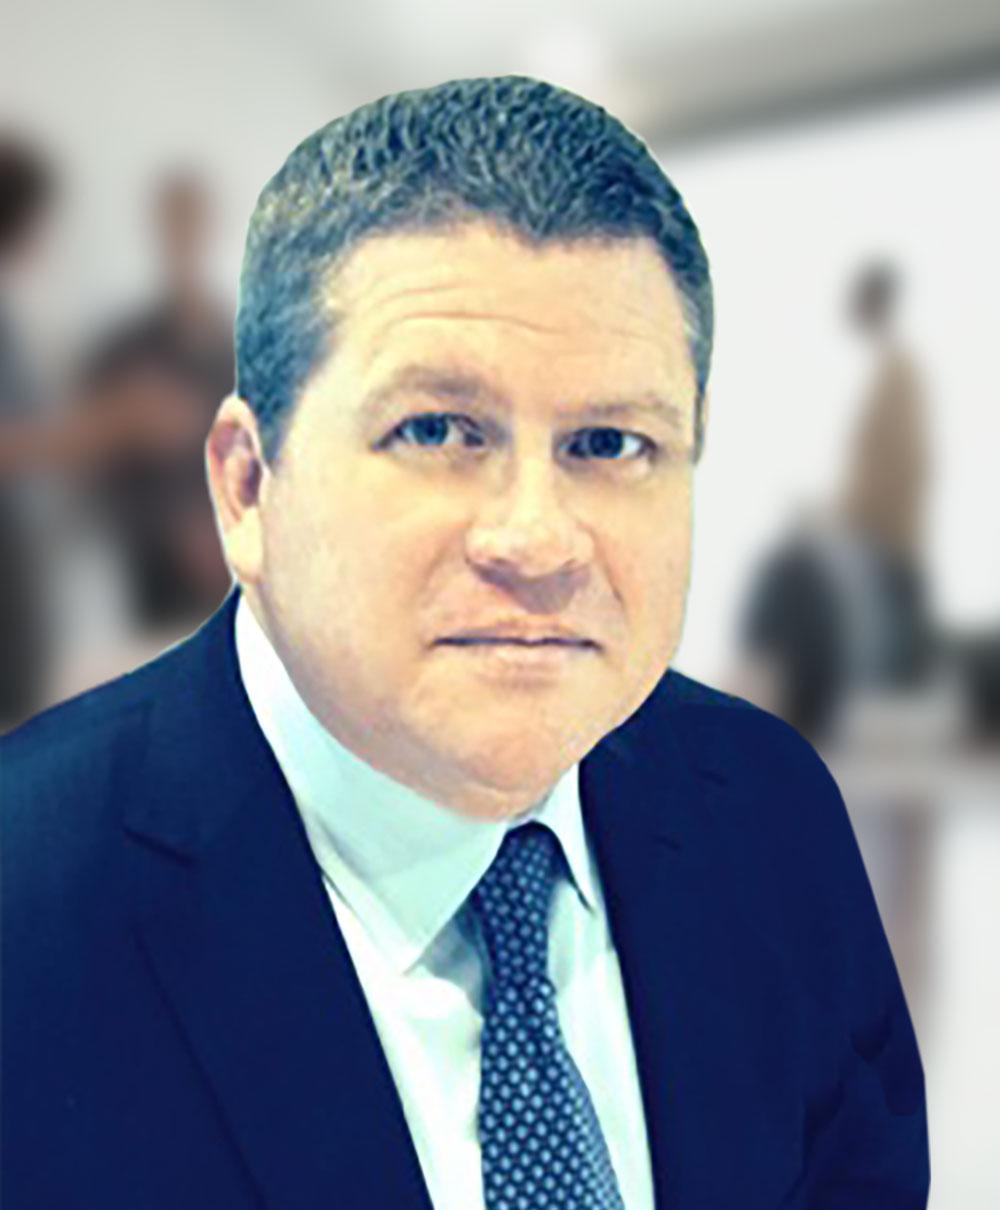 David Foster Company Director and Advisor